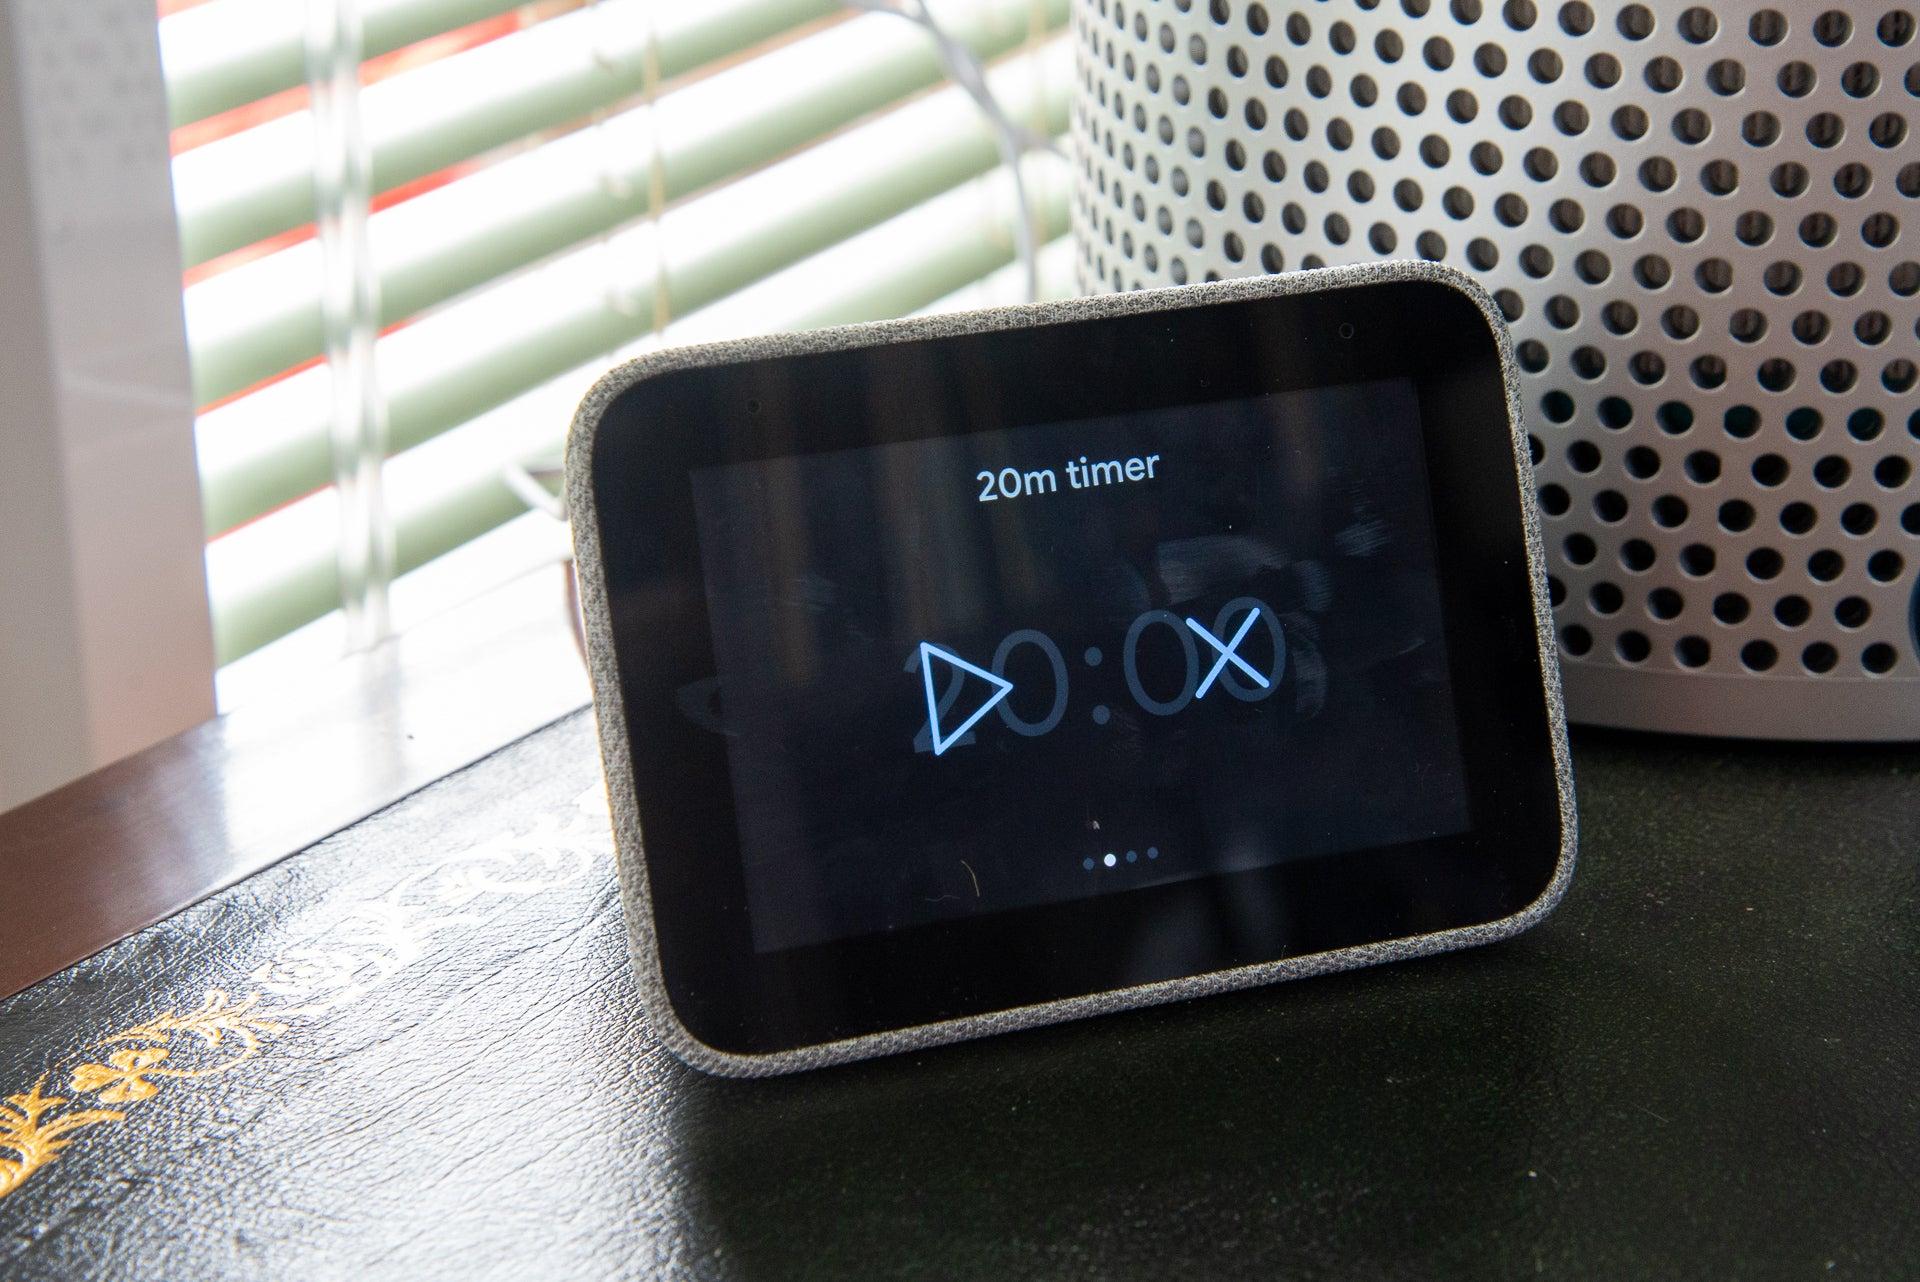 Lenovo Smart Clock nap timer